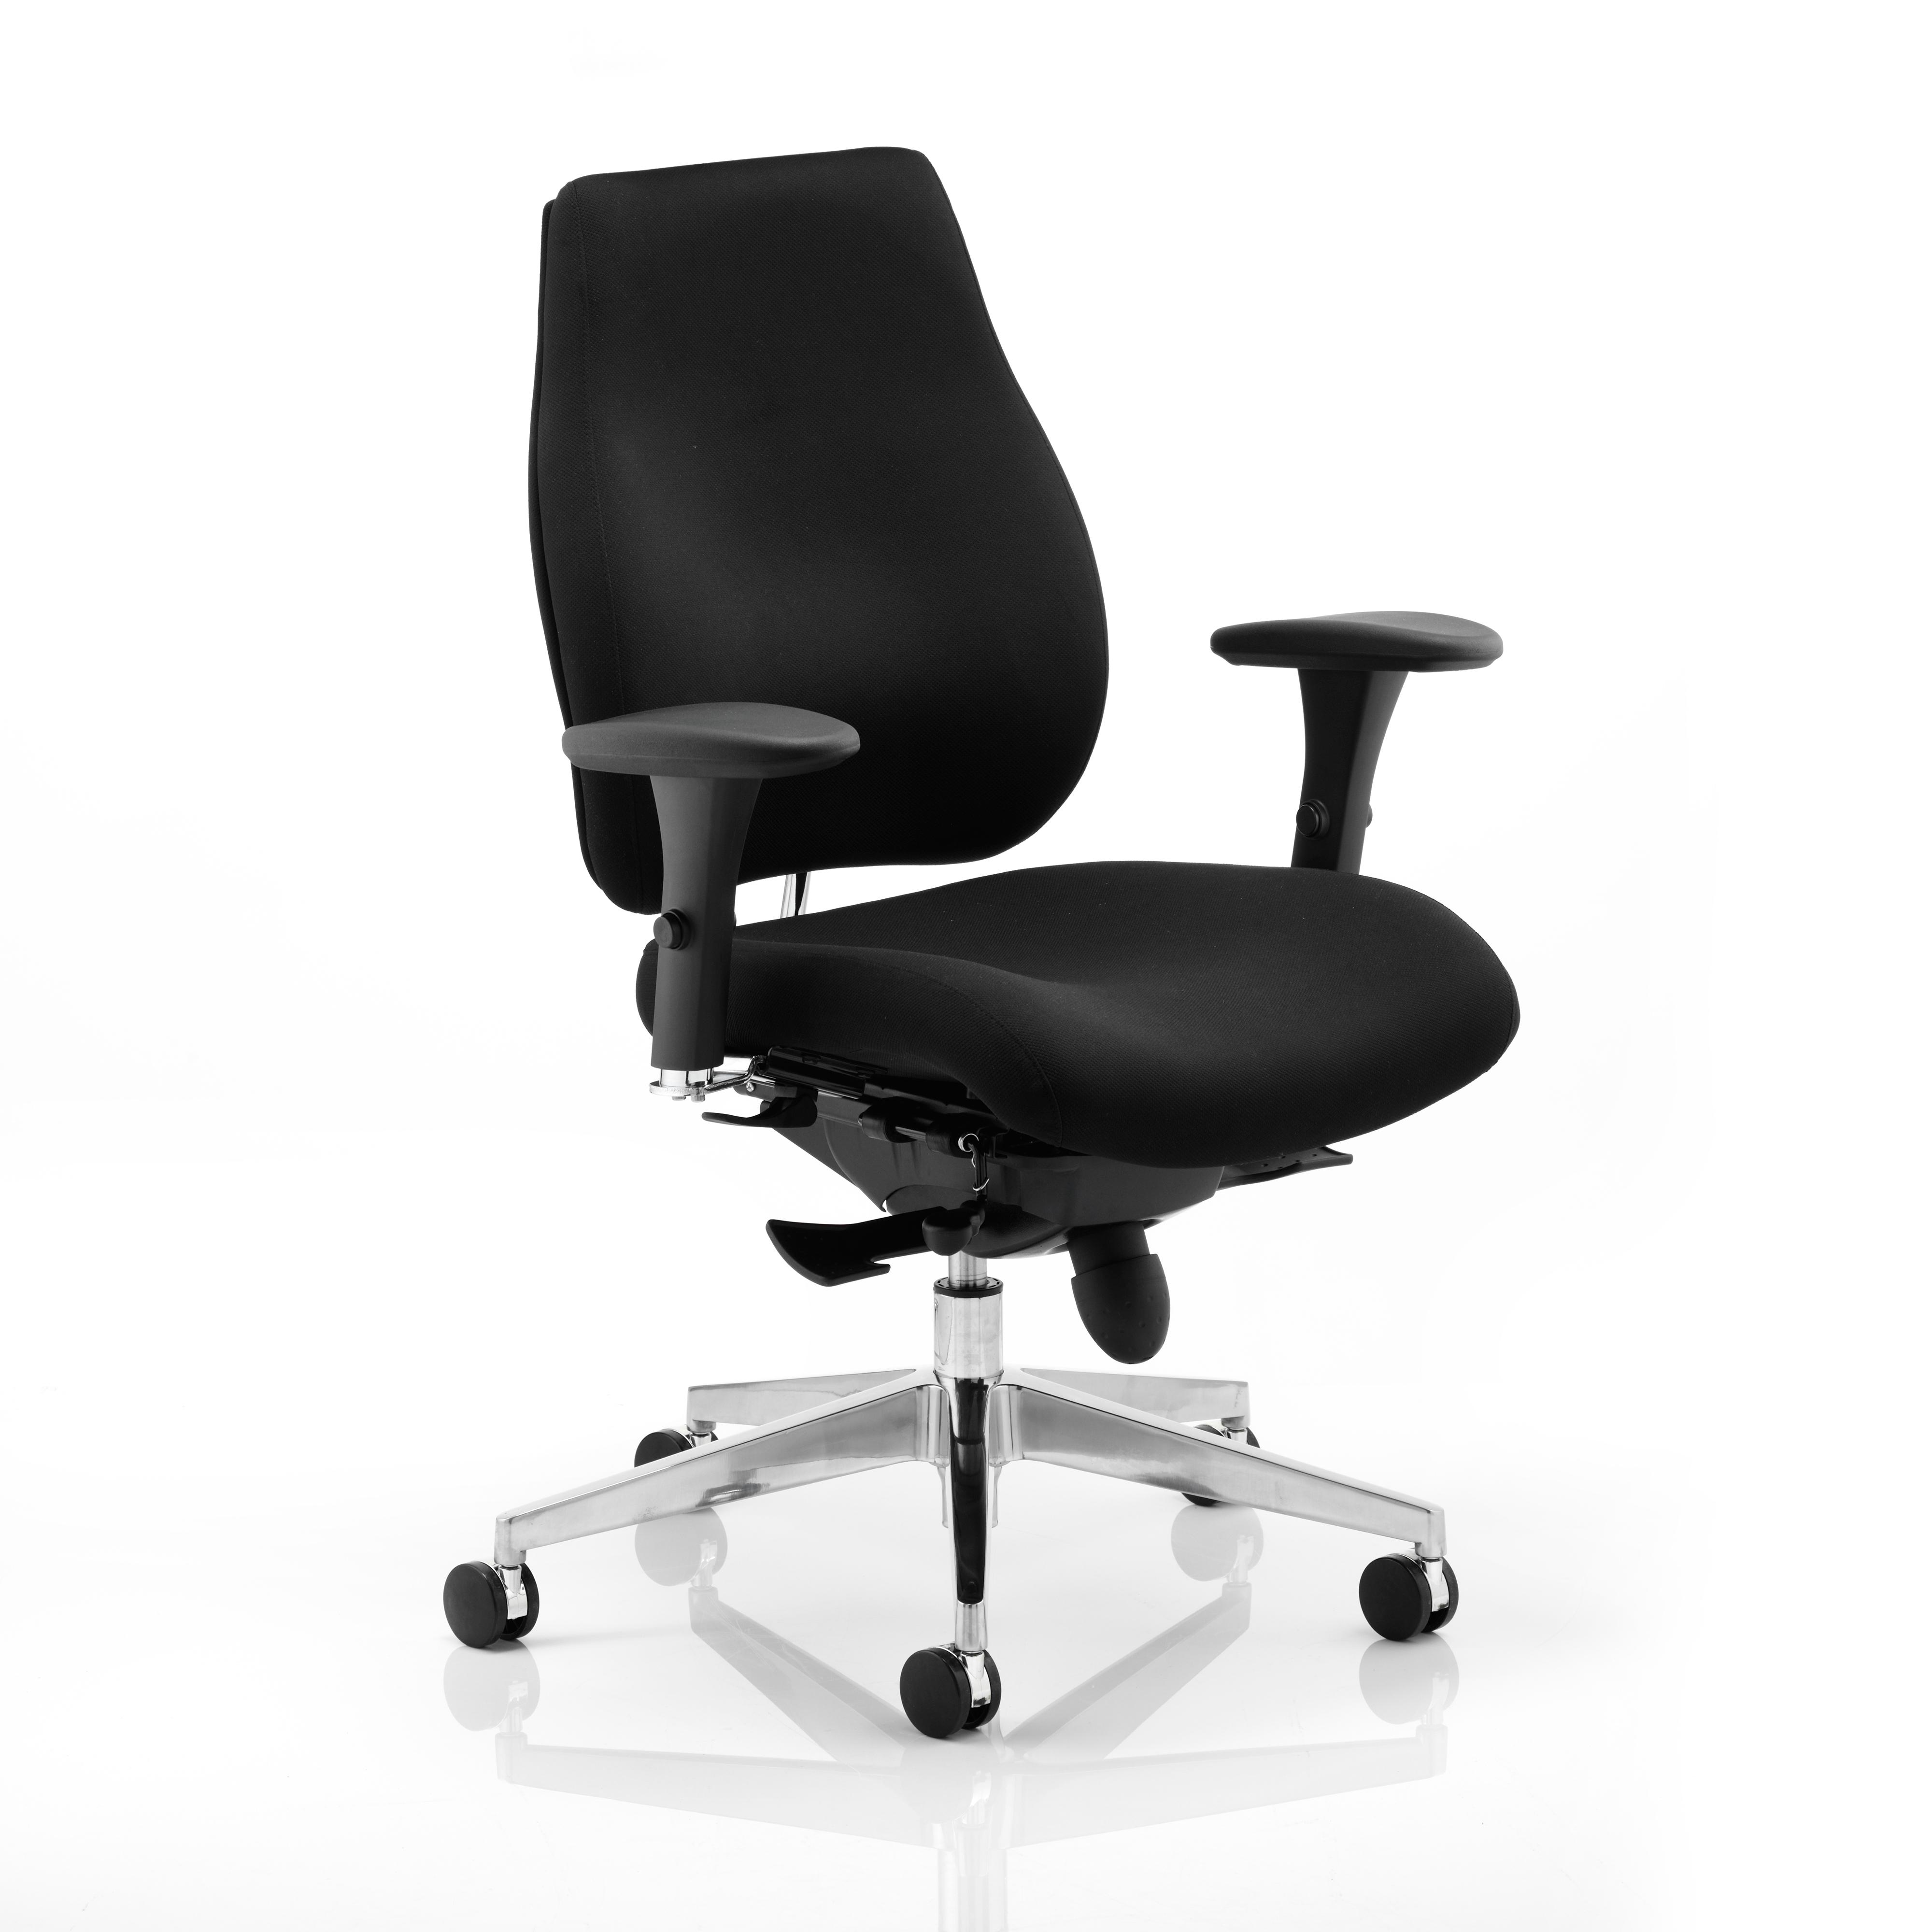 Sonix Chiro Plus High Back Posture Chair Black 495x520-560x470-540mm Ref PO000001